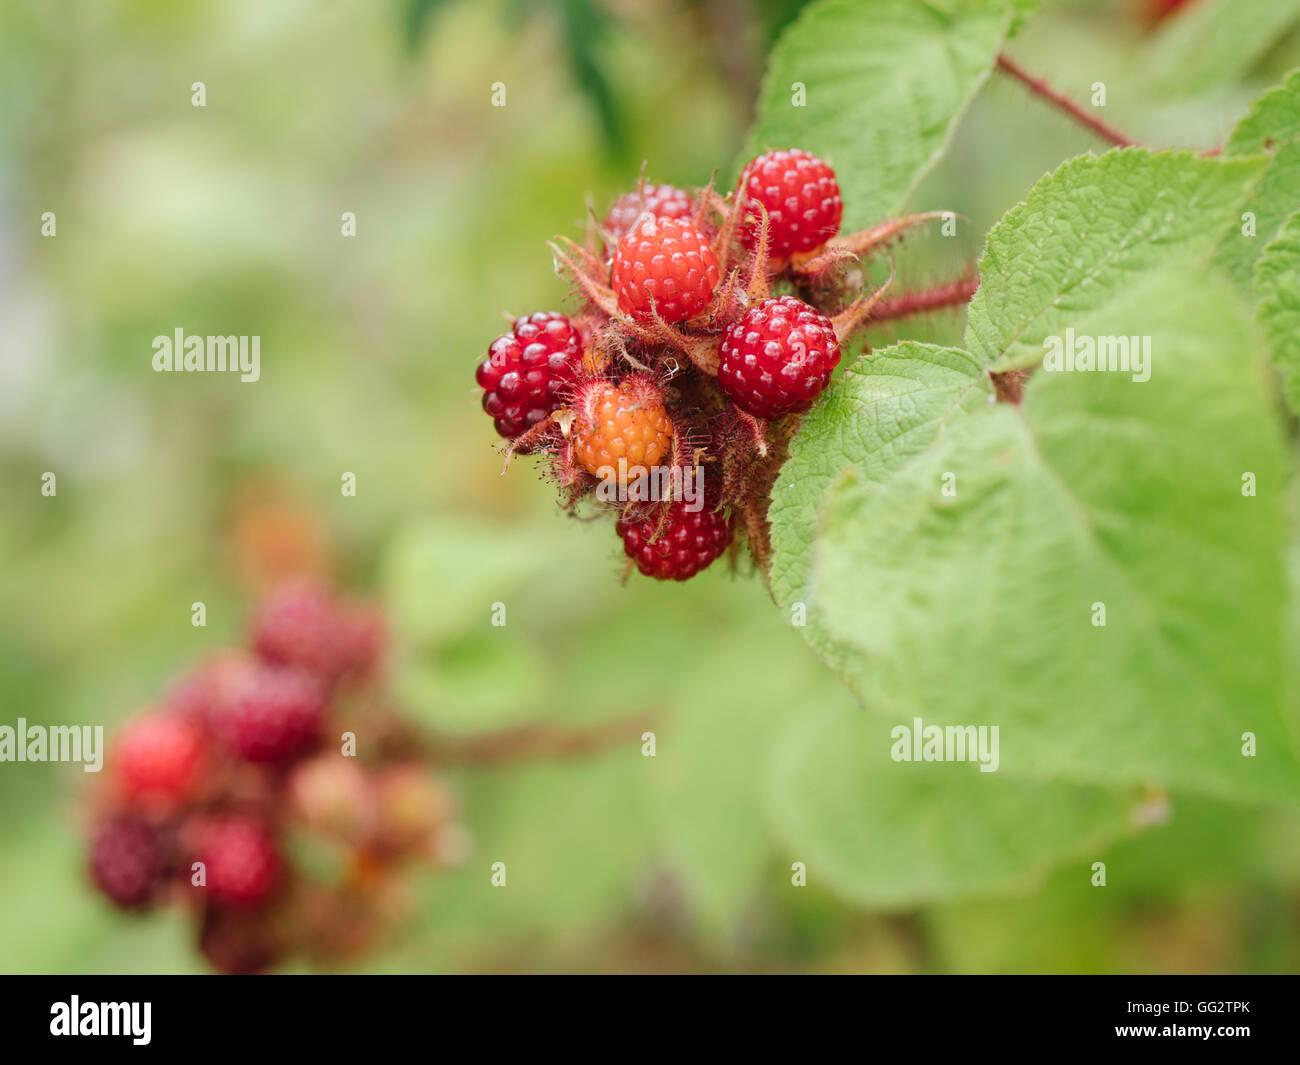 Detail of Japanese Wineberries (Rubus phoenicolasius) in a garden.Stock Photo